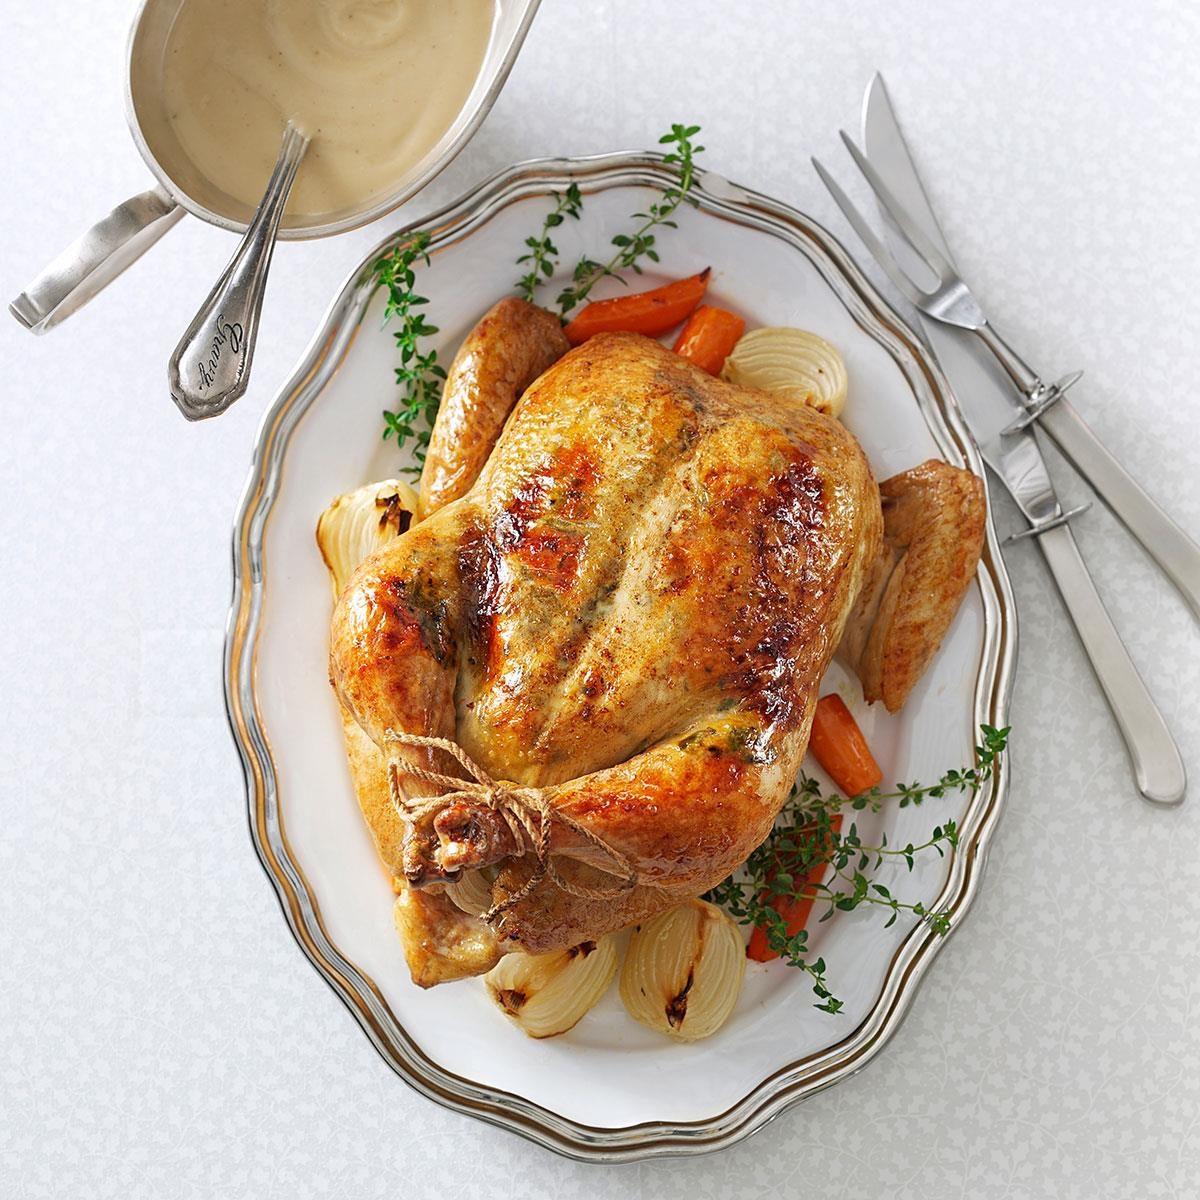 Rosemary-Orange Roasted Chicken Recipe | Taste of Home